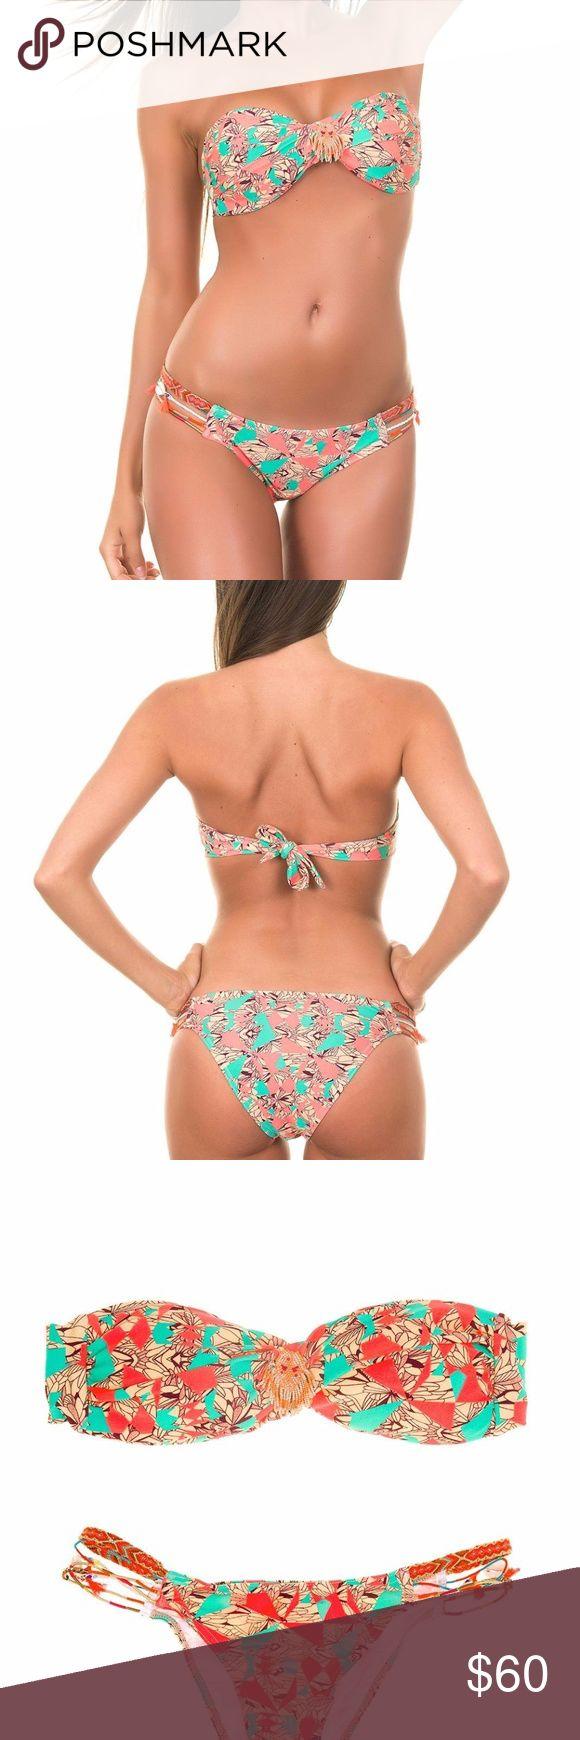 Amenapih Women Plumteez Pink Bandeau Bikini NWT Amenapih women  Palmeez pink/coral  Bikini top bottom swim suit Size medium New with tags  AHS16 Amenapih Swim Bikinis